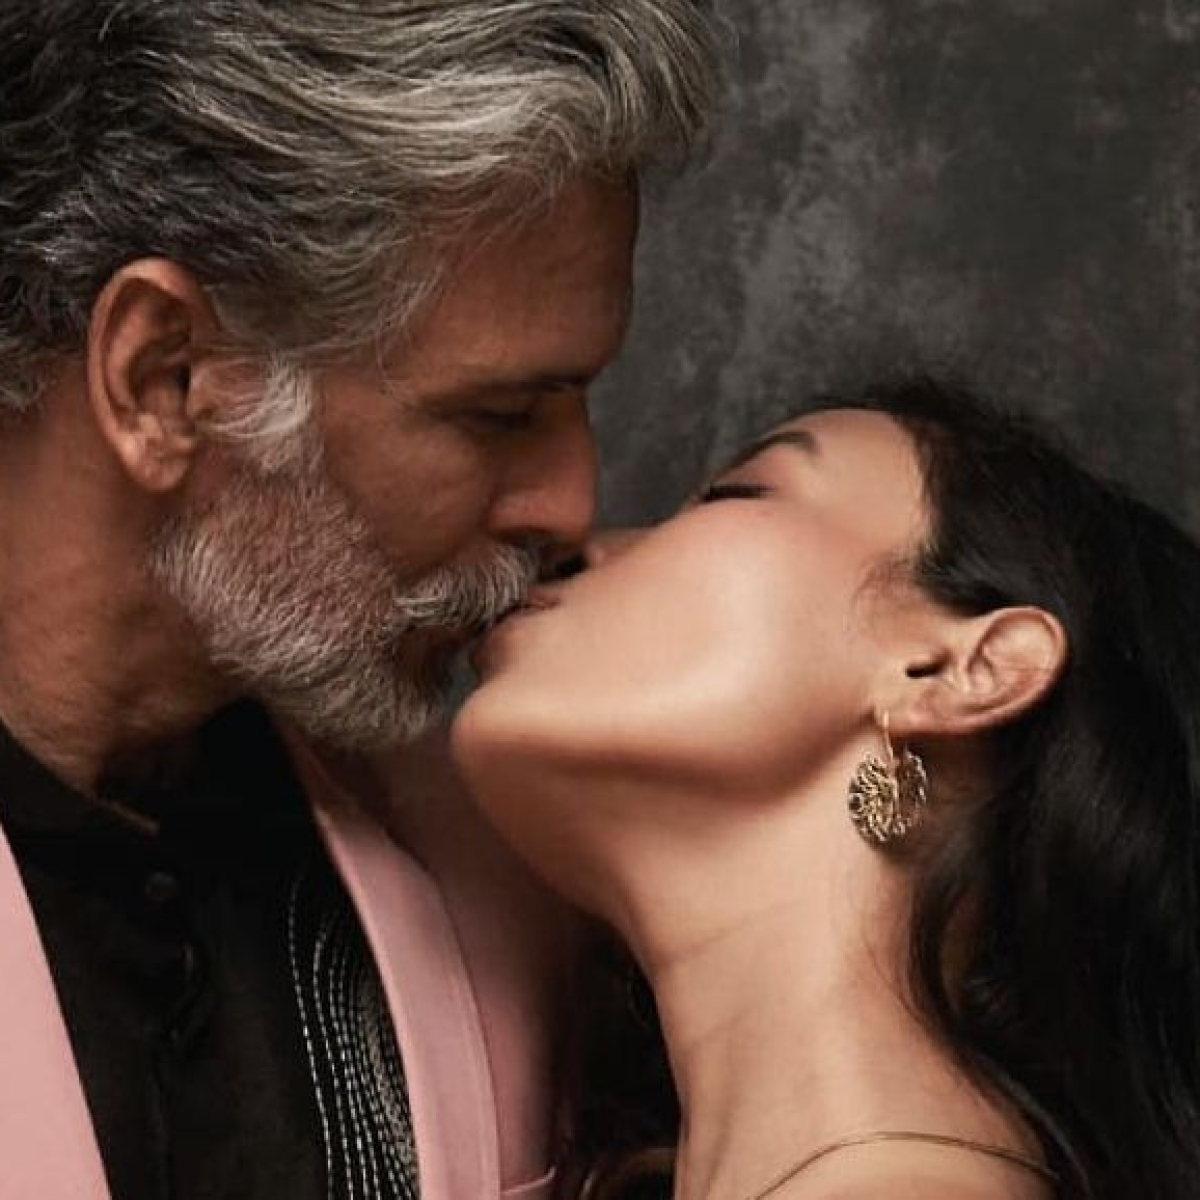 Milind Soman, Ankita Konwar indulge in a steamy lip-lock to promote vegan fashion